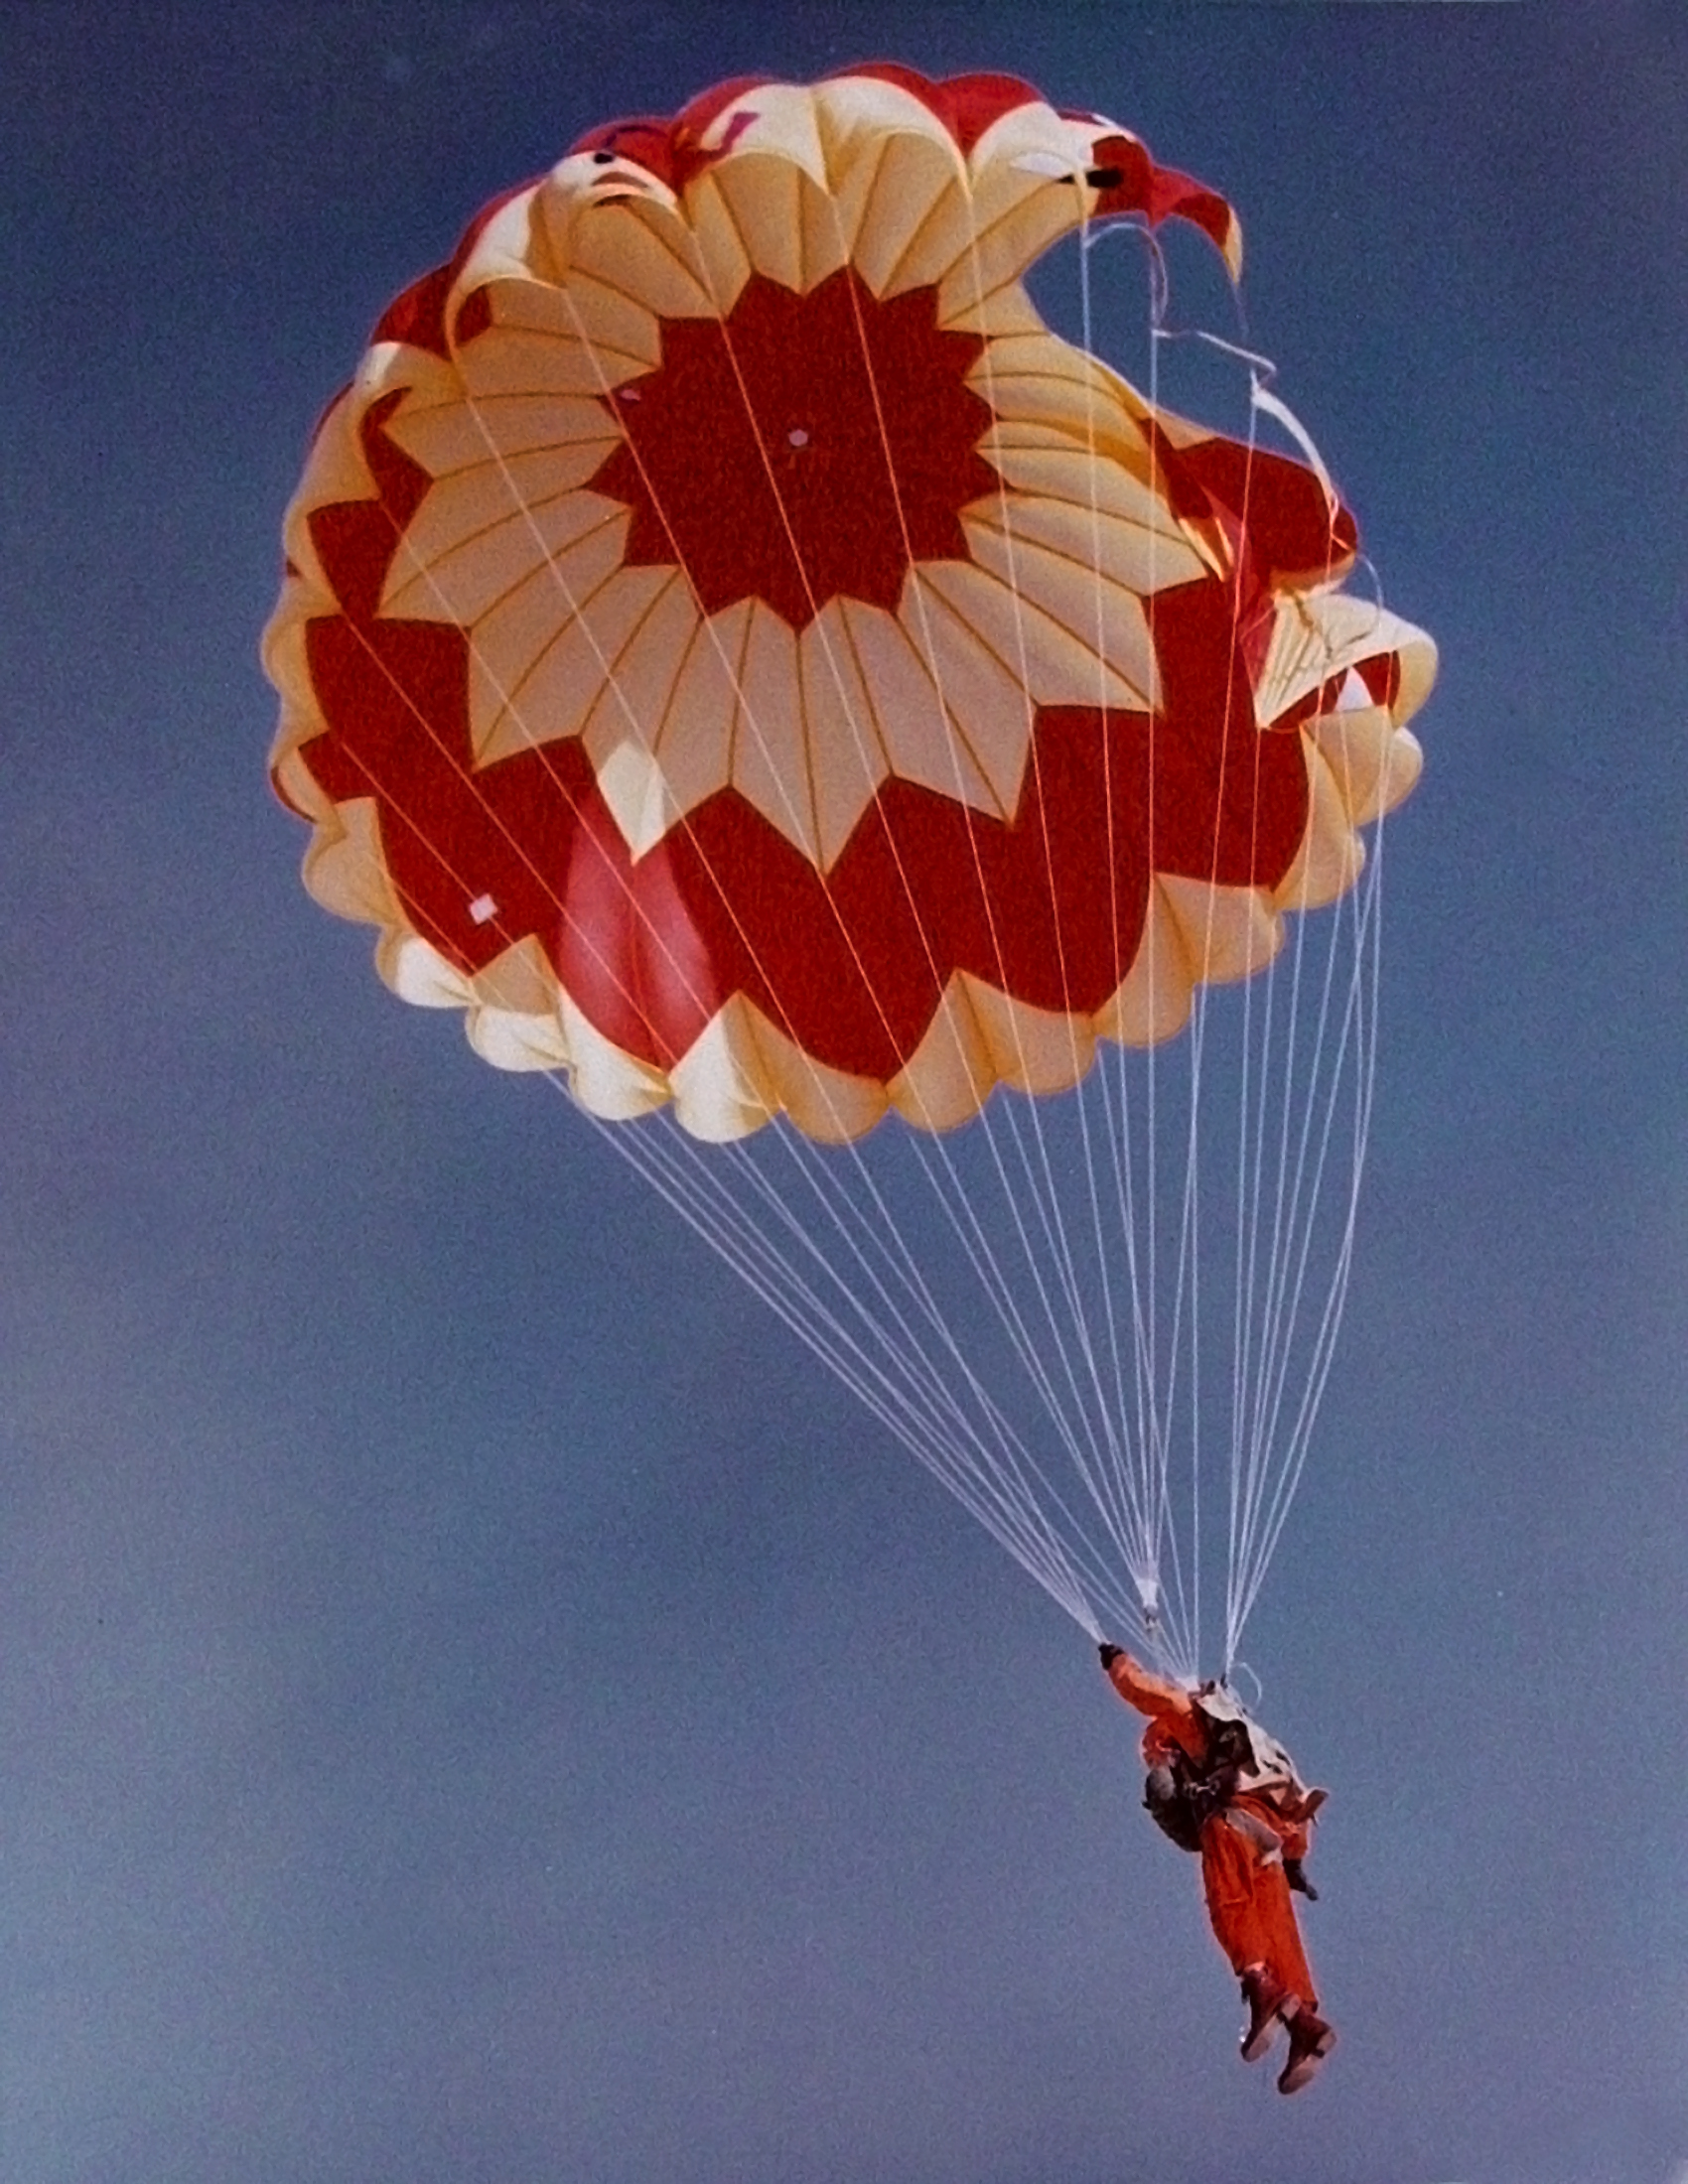 parachutetest1960.jpg